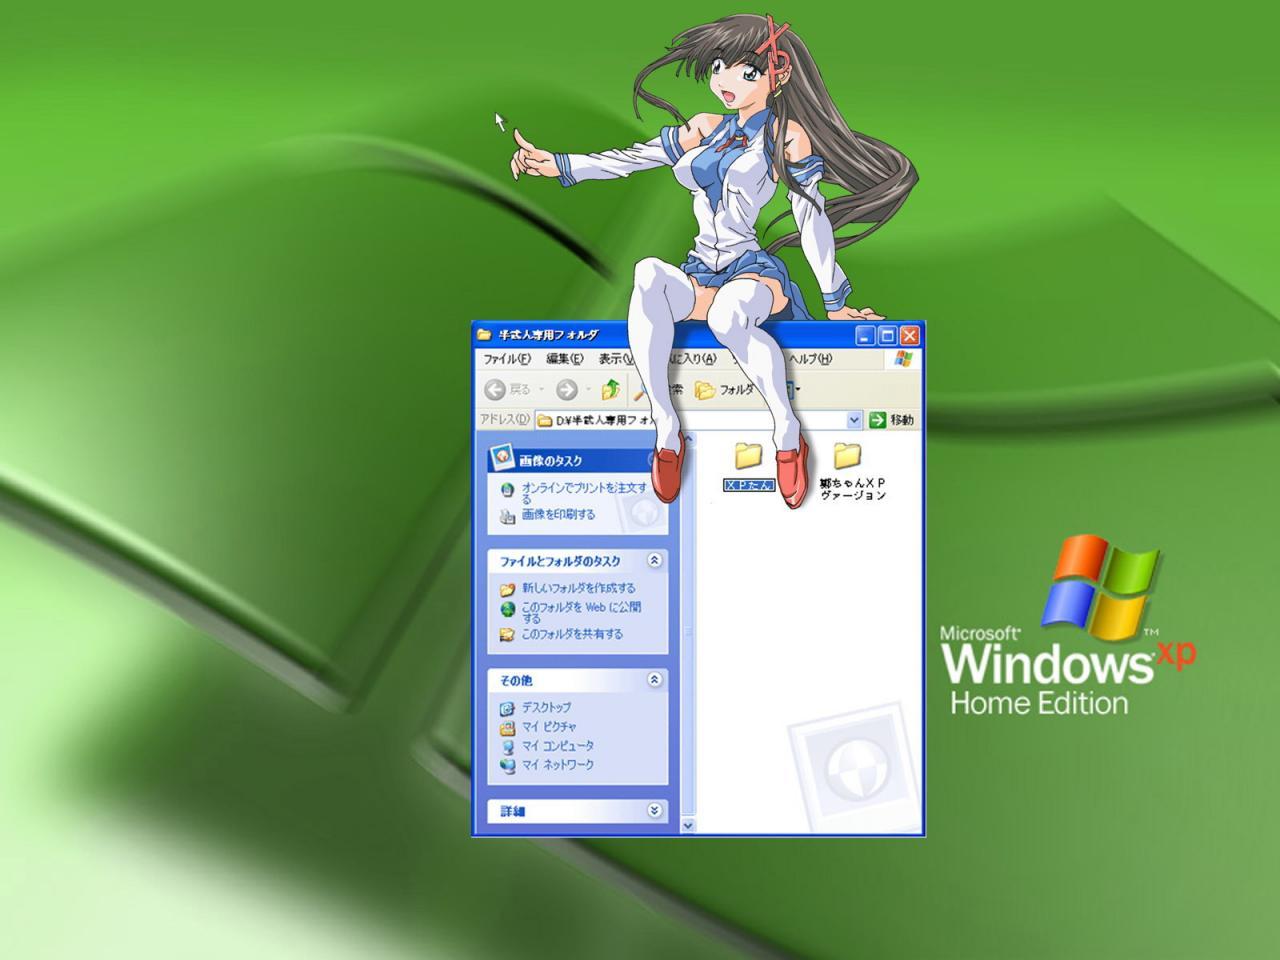 Wallpaper Theme Windows XP Sexy sur la fenetre